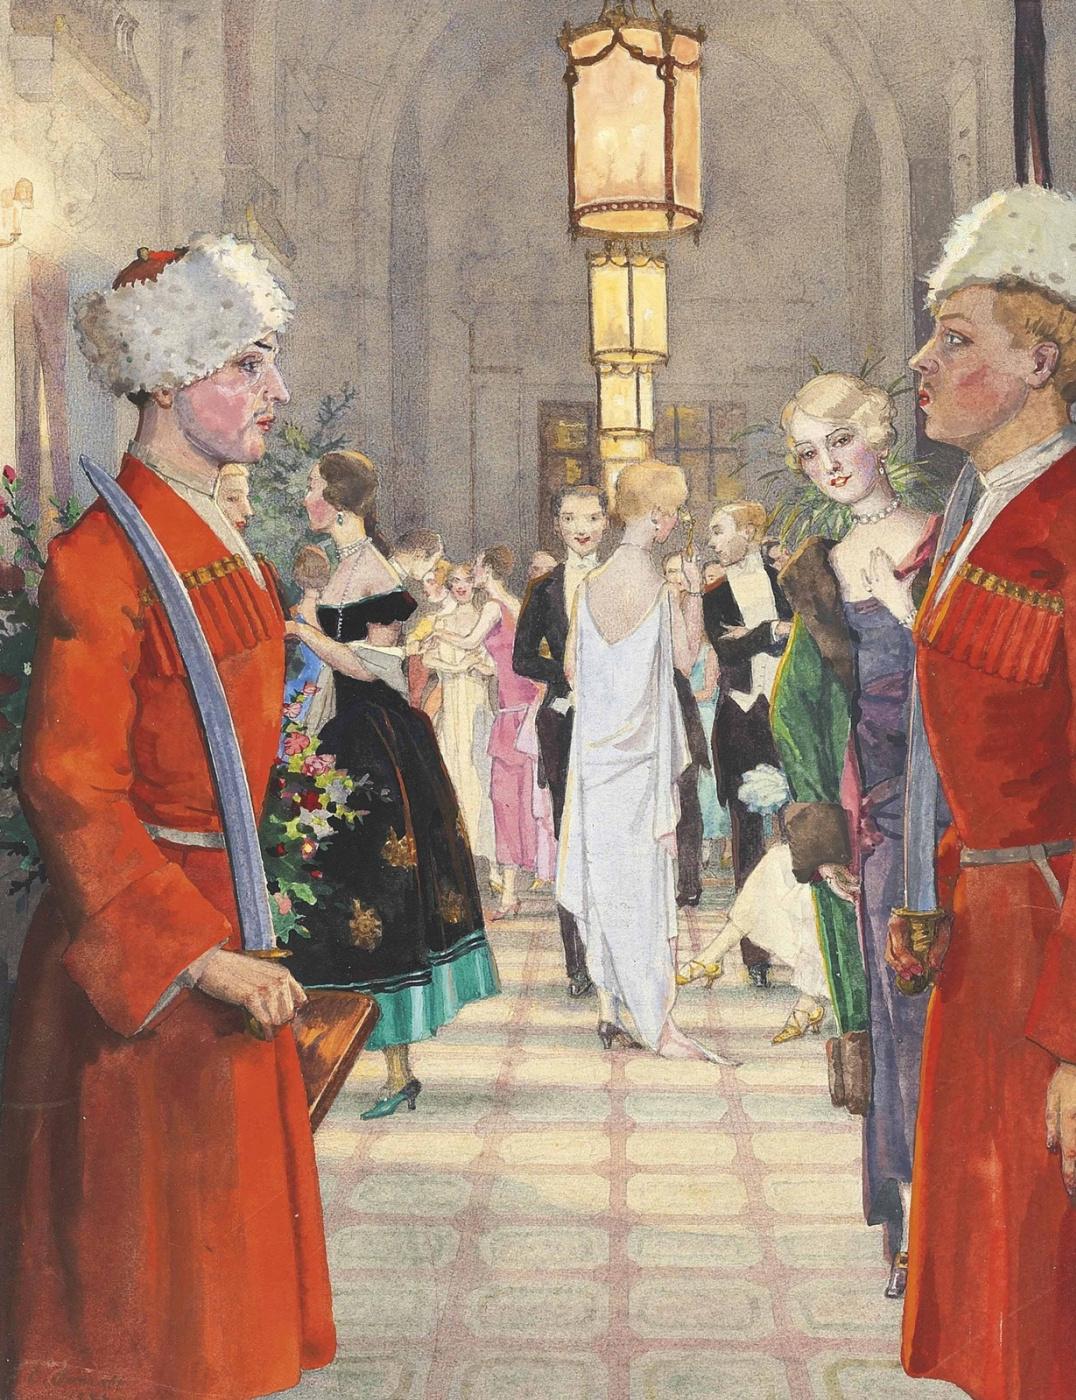 Konstantin Somov. The Cossack ball